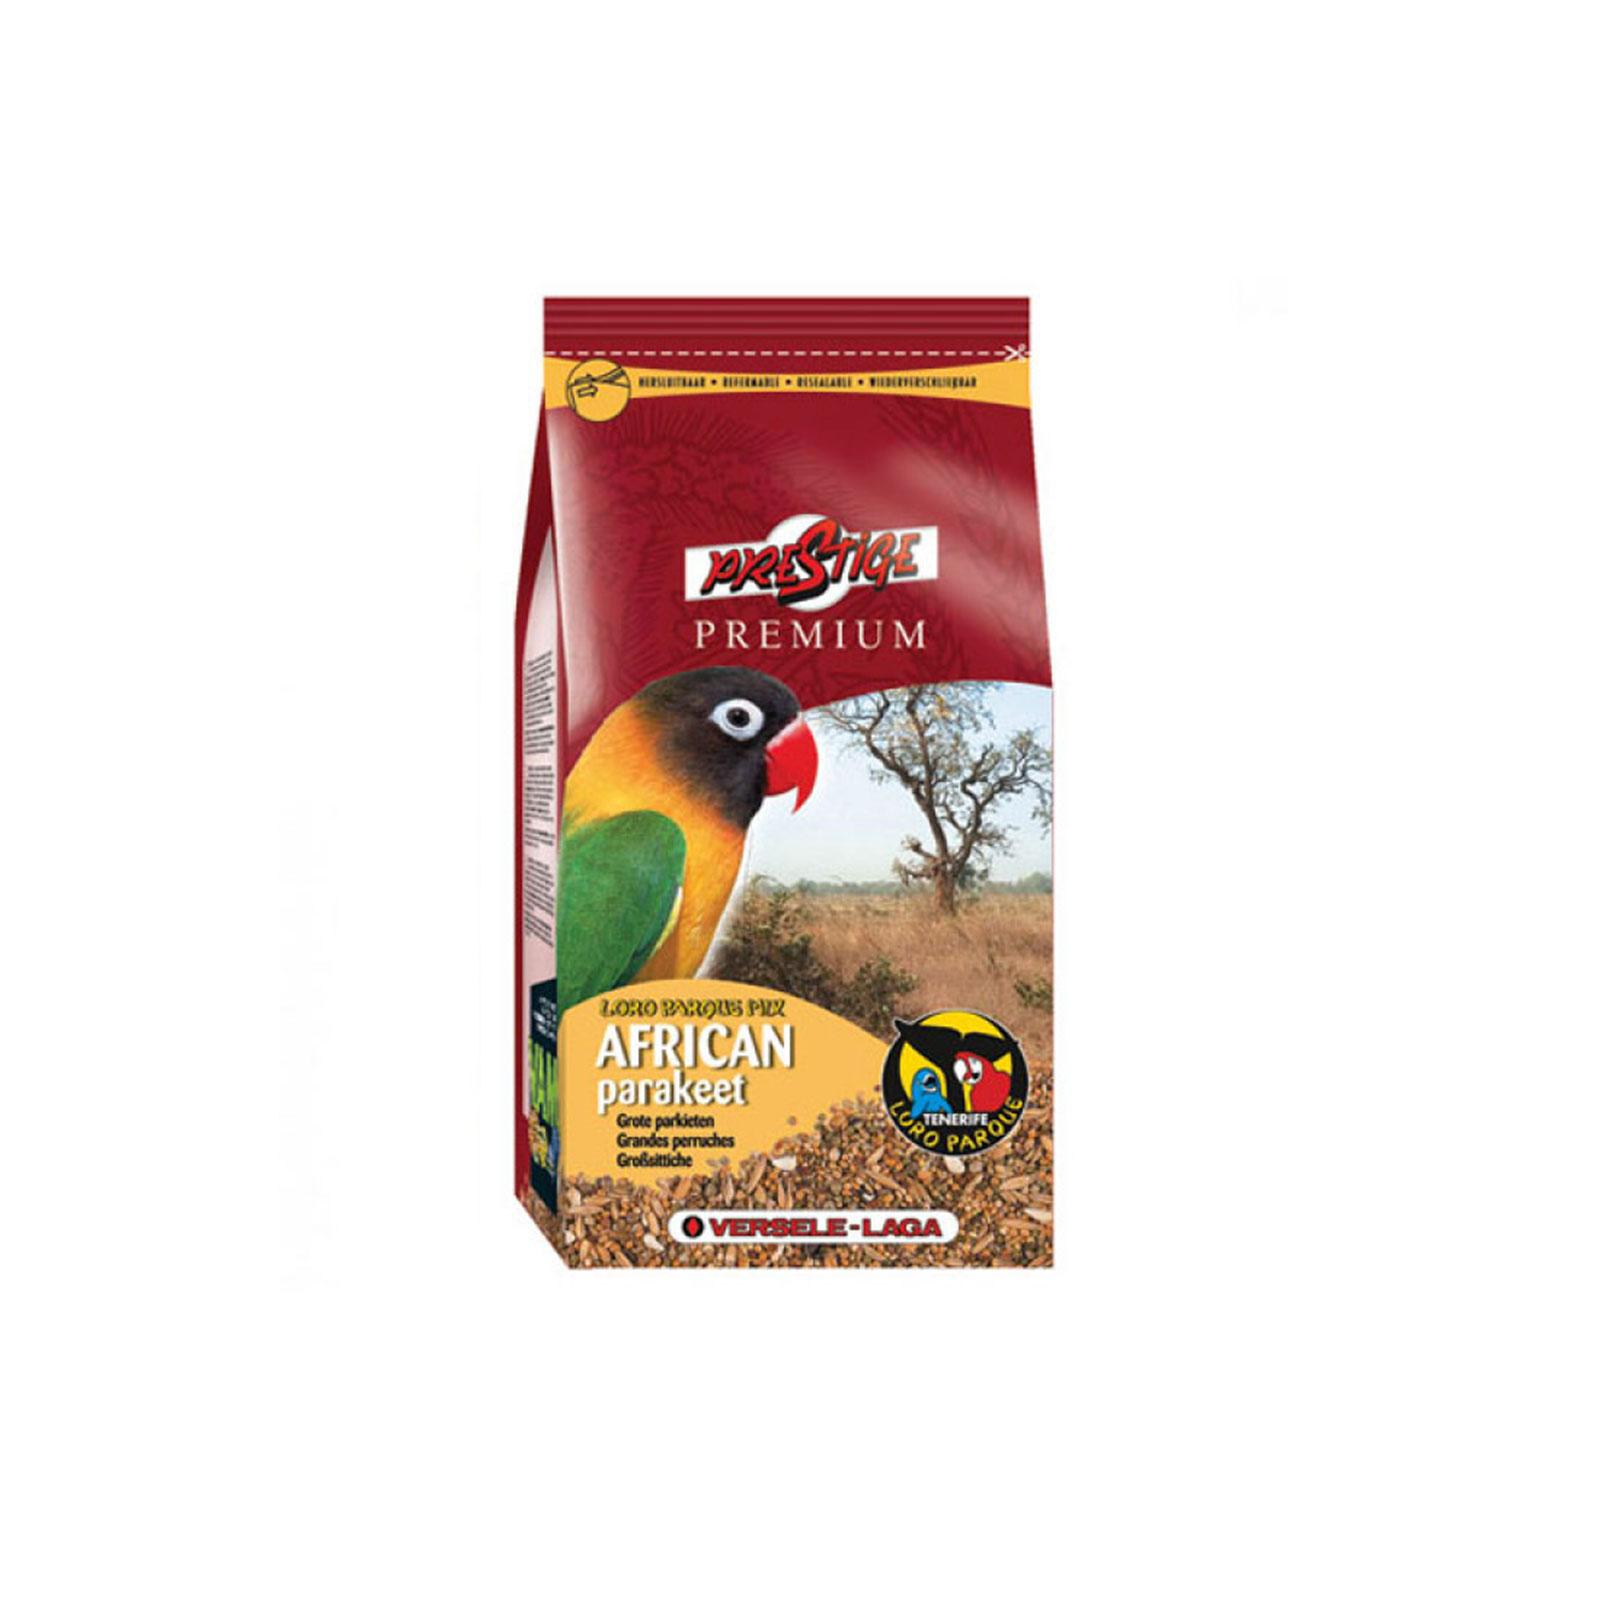 Versele Laga - Prestige premium african parakeet - Premium hrana za afričke male papagaje